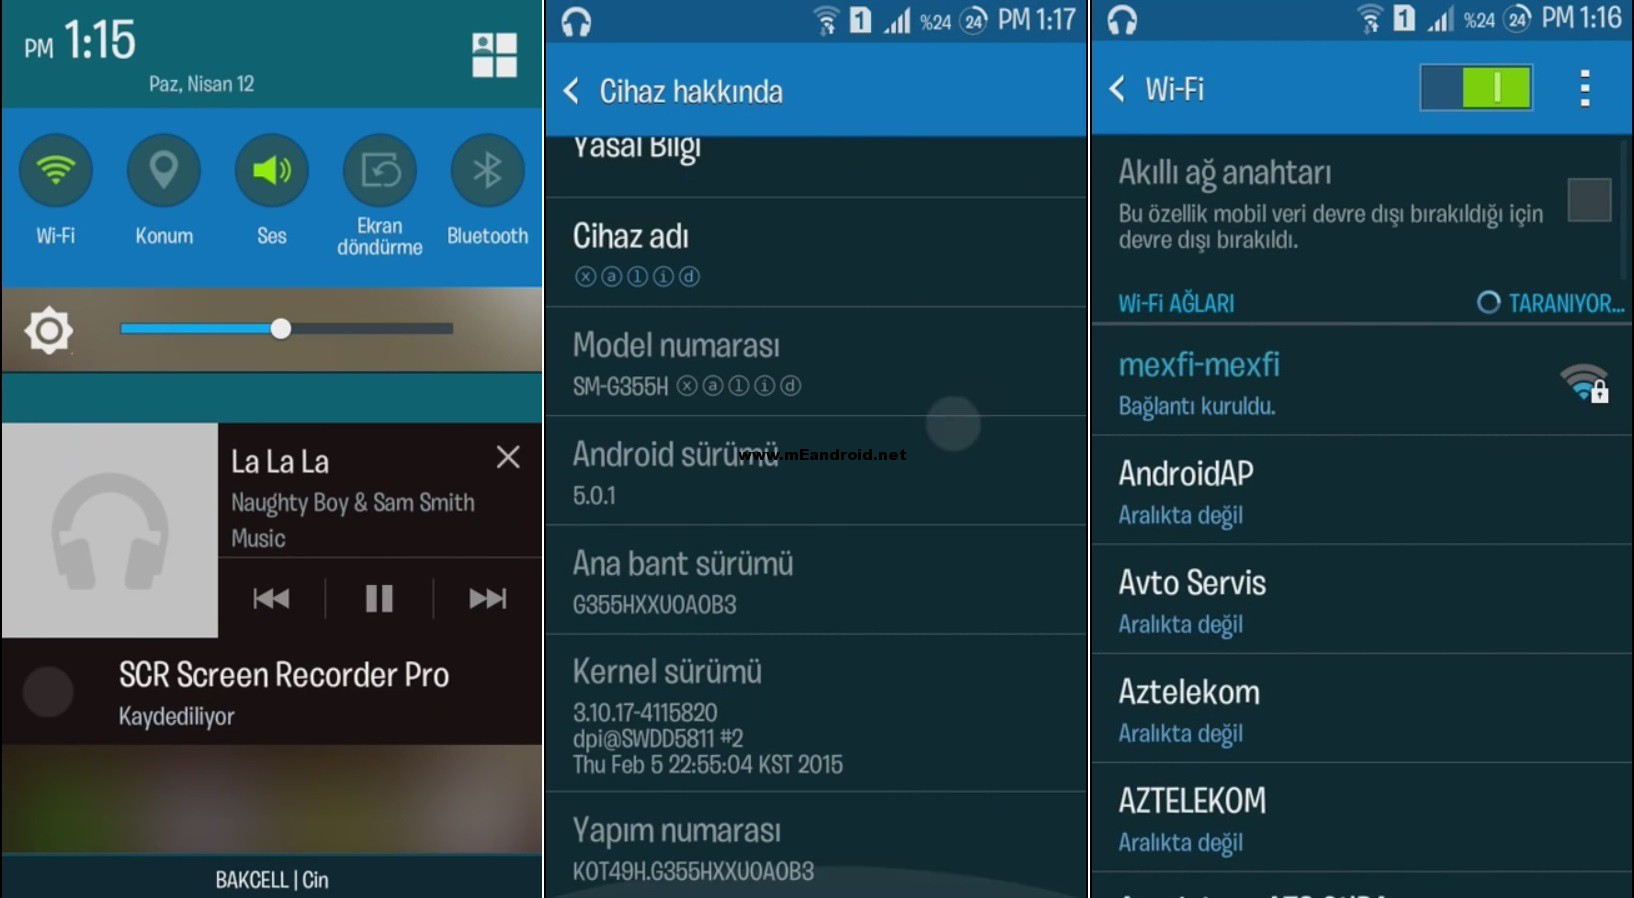 Galaxy Core 2 SM G355H Android 5.0 Lollipop ROM screenshot 2 روم اندرويد 5 لولي بوب لهاتف Galaxy Core 2 SM G355H